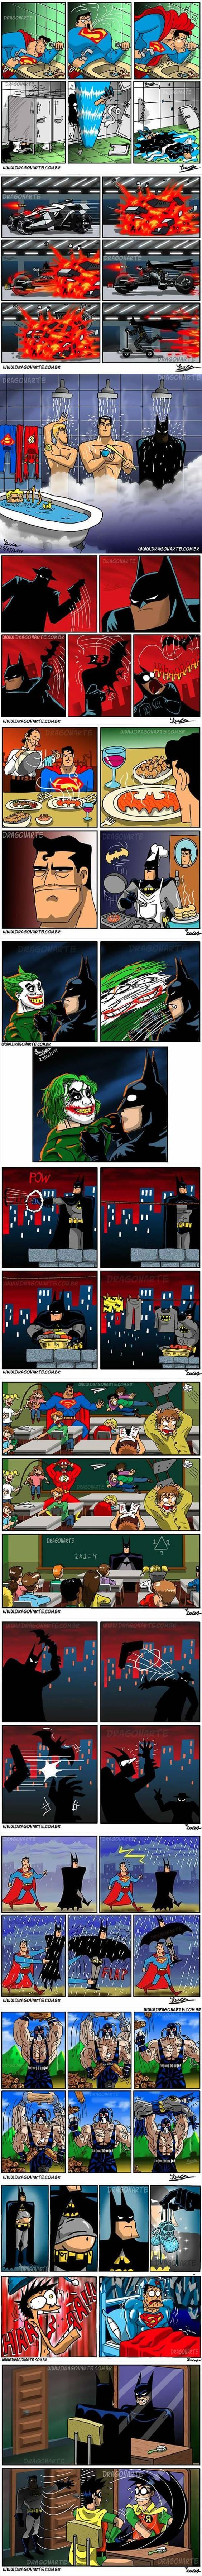 The Funniest Superhero Comics Collection (Part 1):